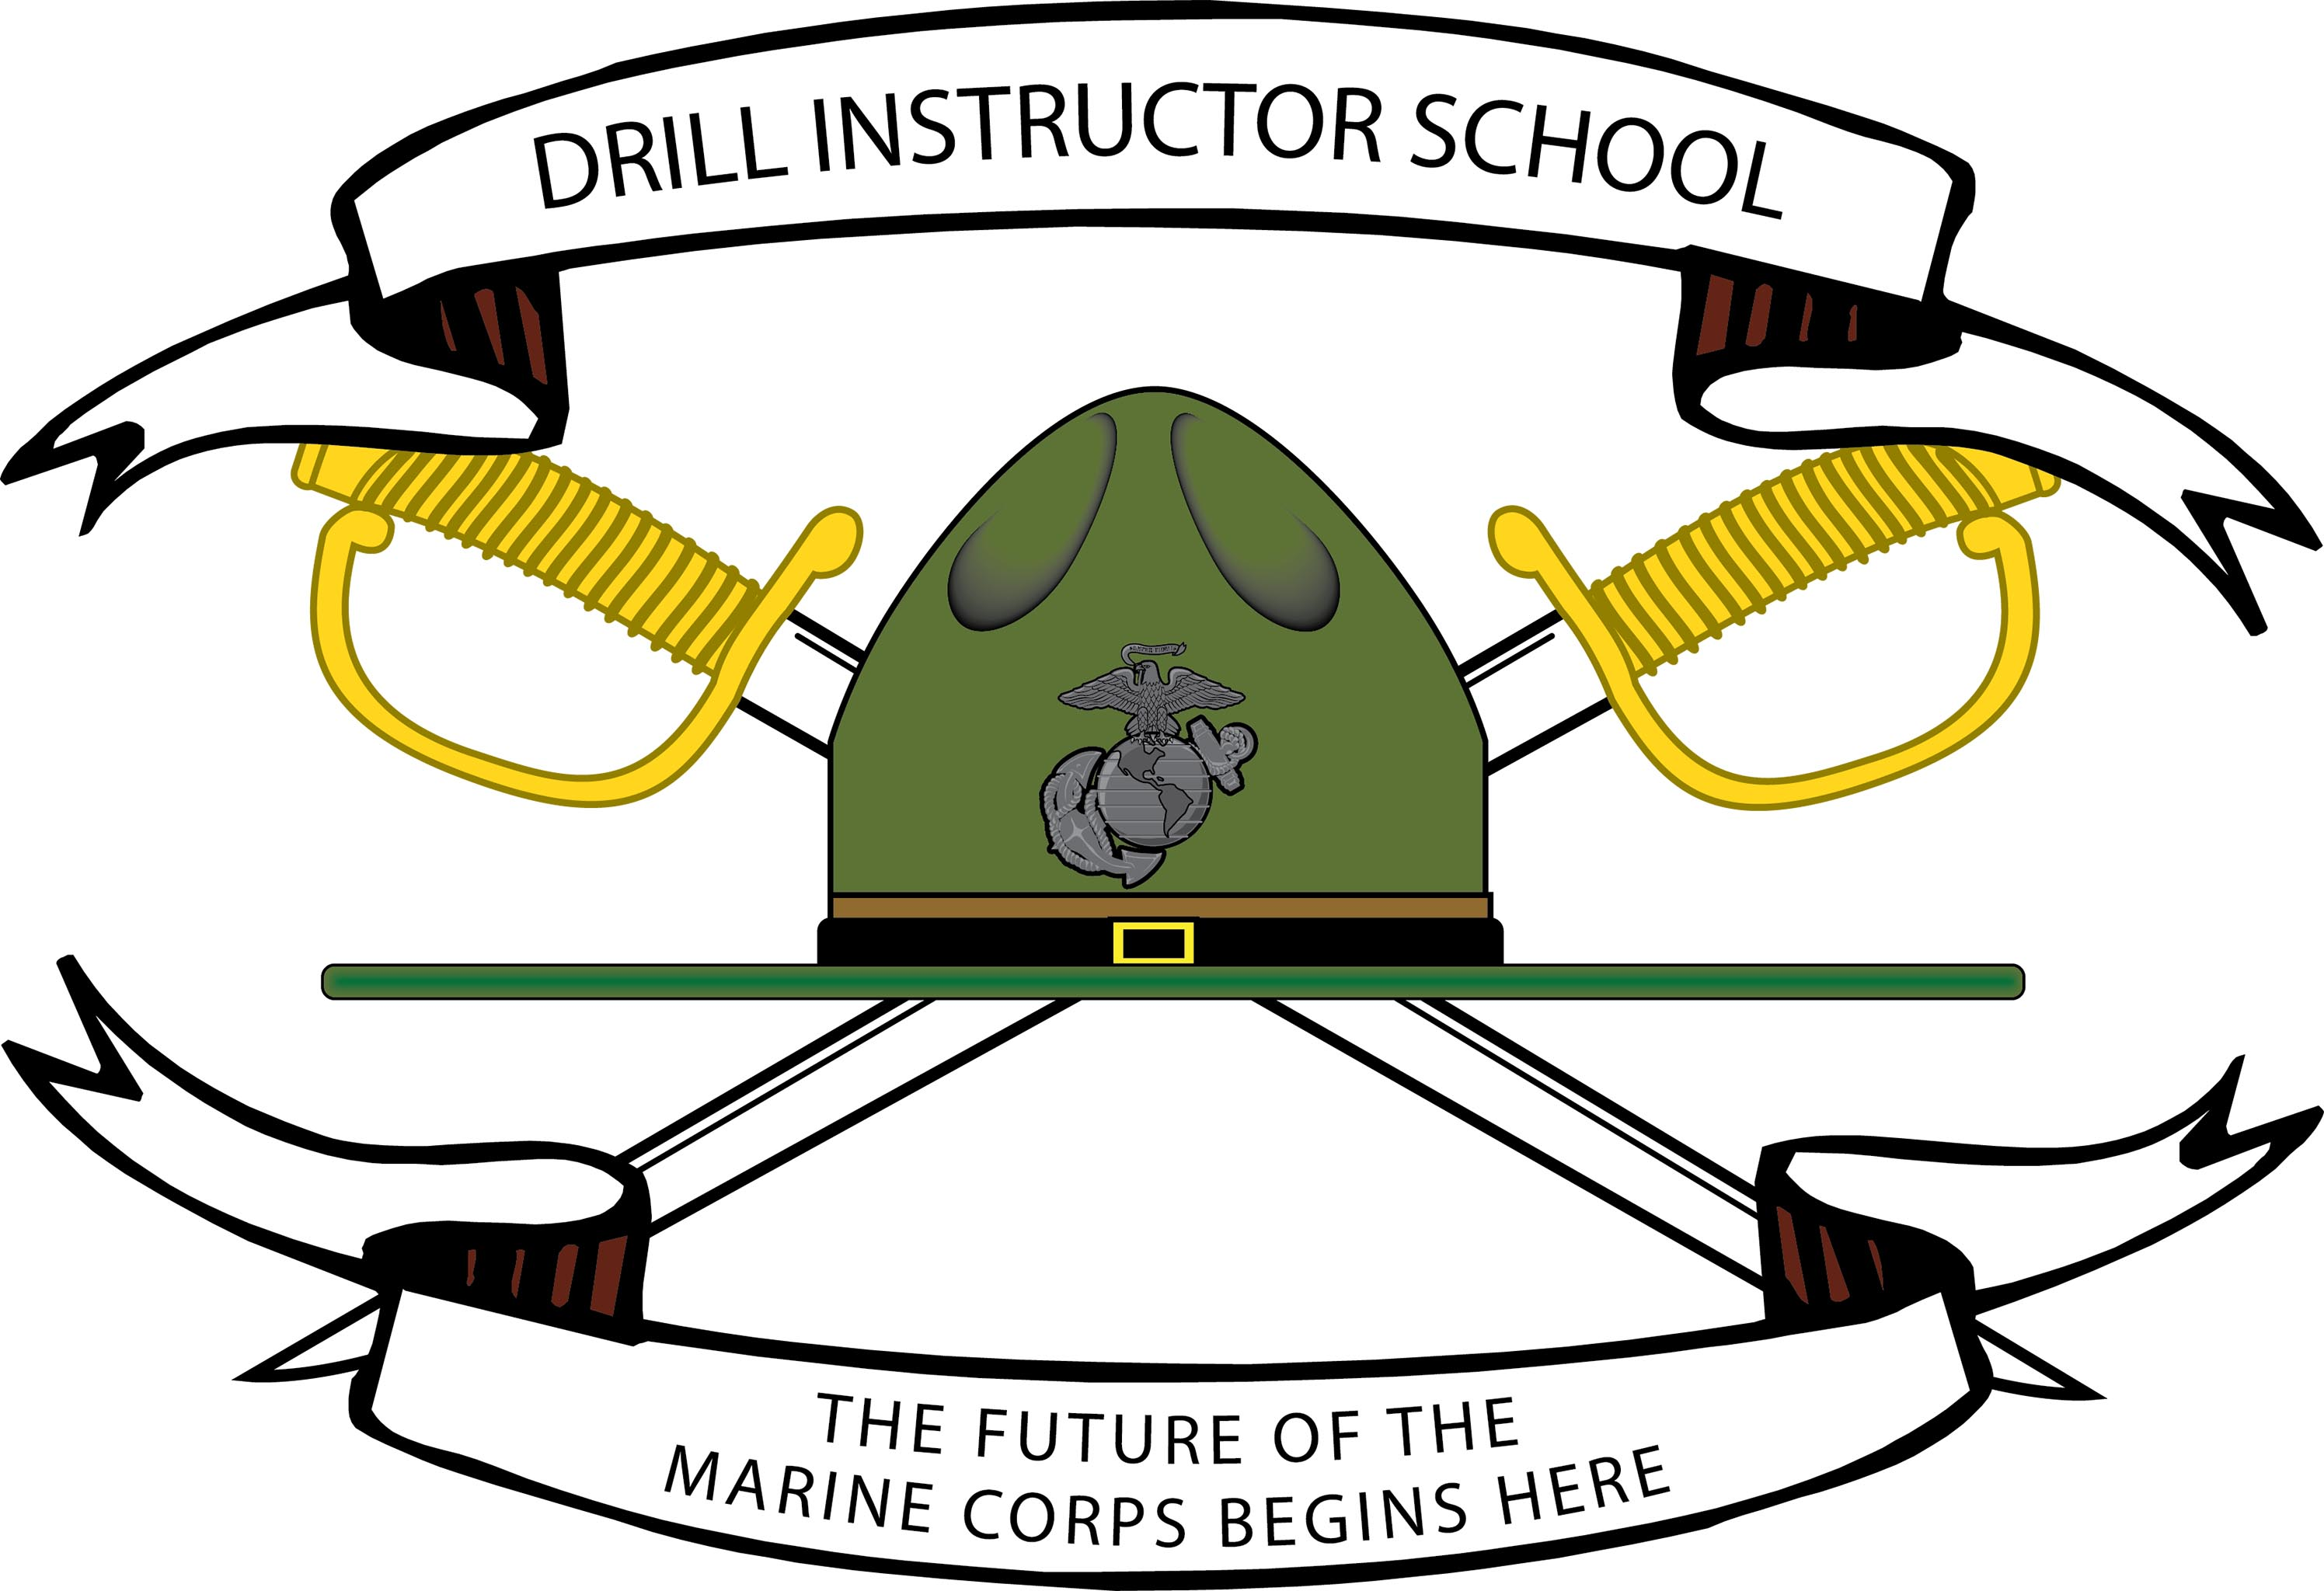 marine corps clipart at getdrawings com free for personal use rh getdrawings com free marine corps emblem clip art united states marine corps symbols clip art